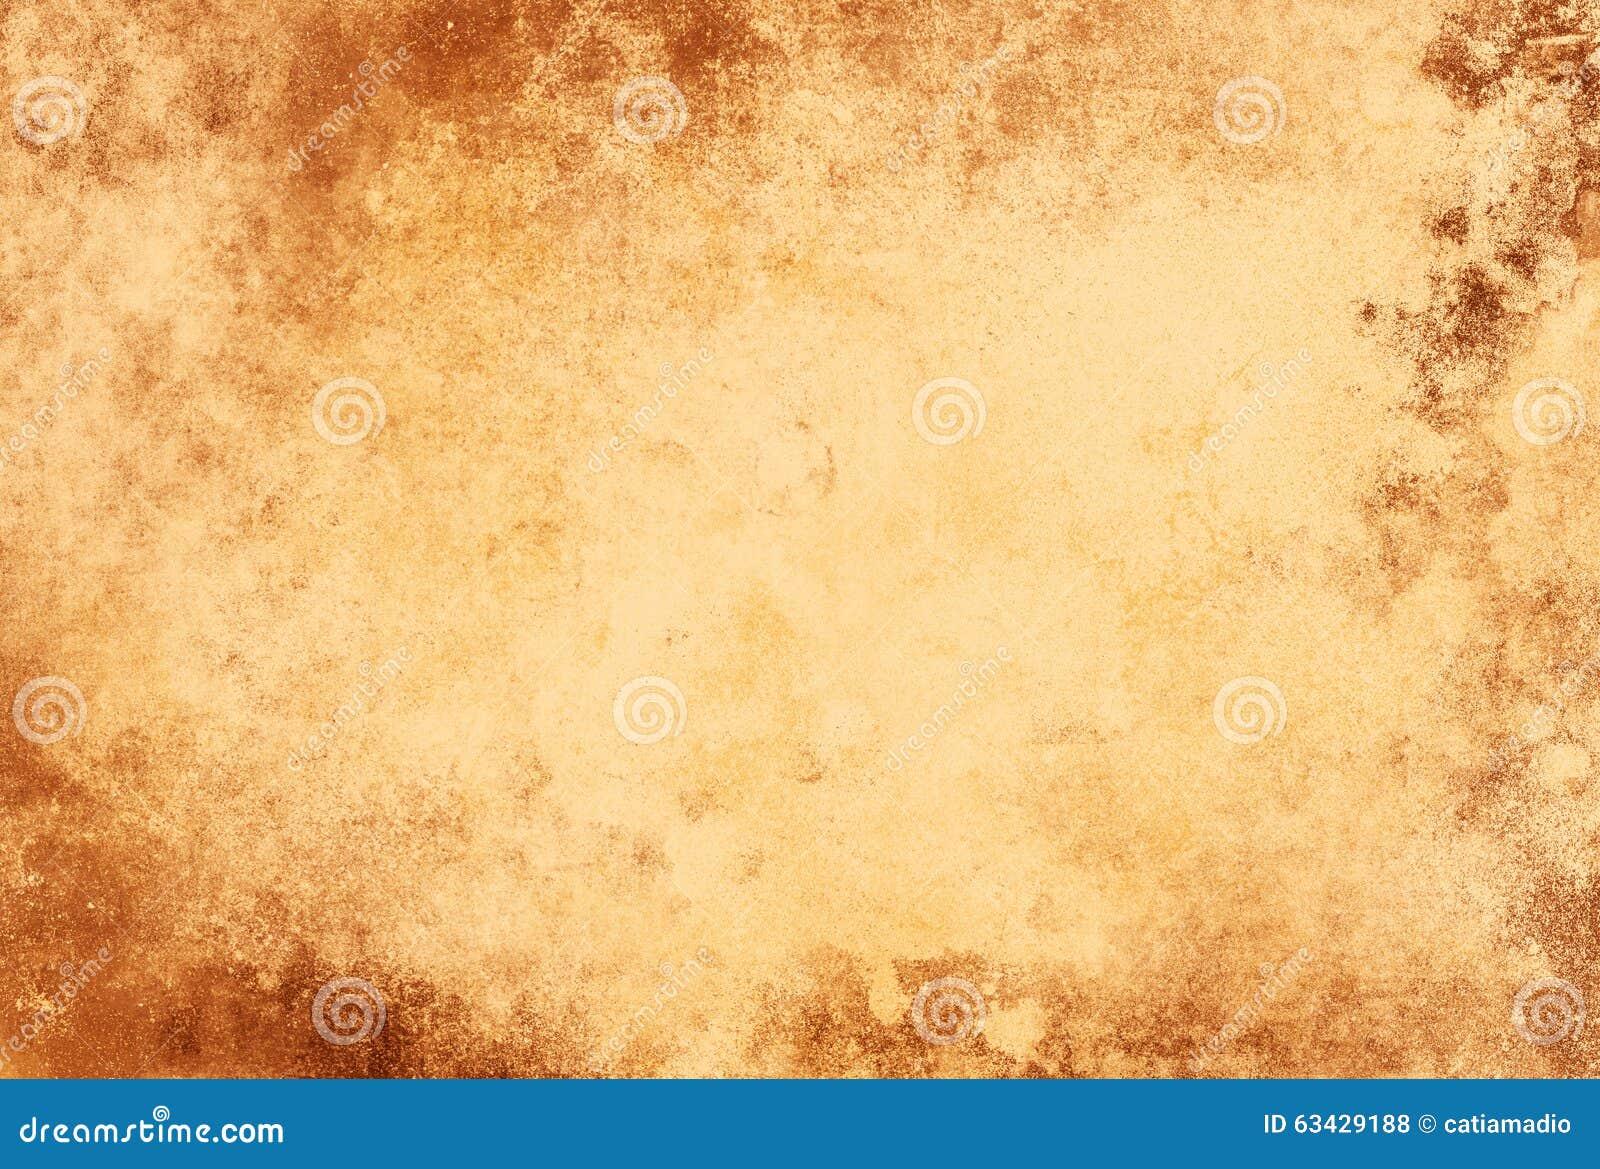 grunge paper texture light brown frame stock illustration